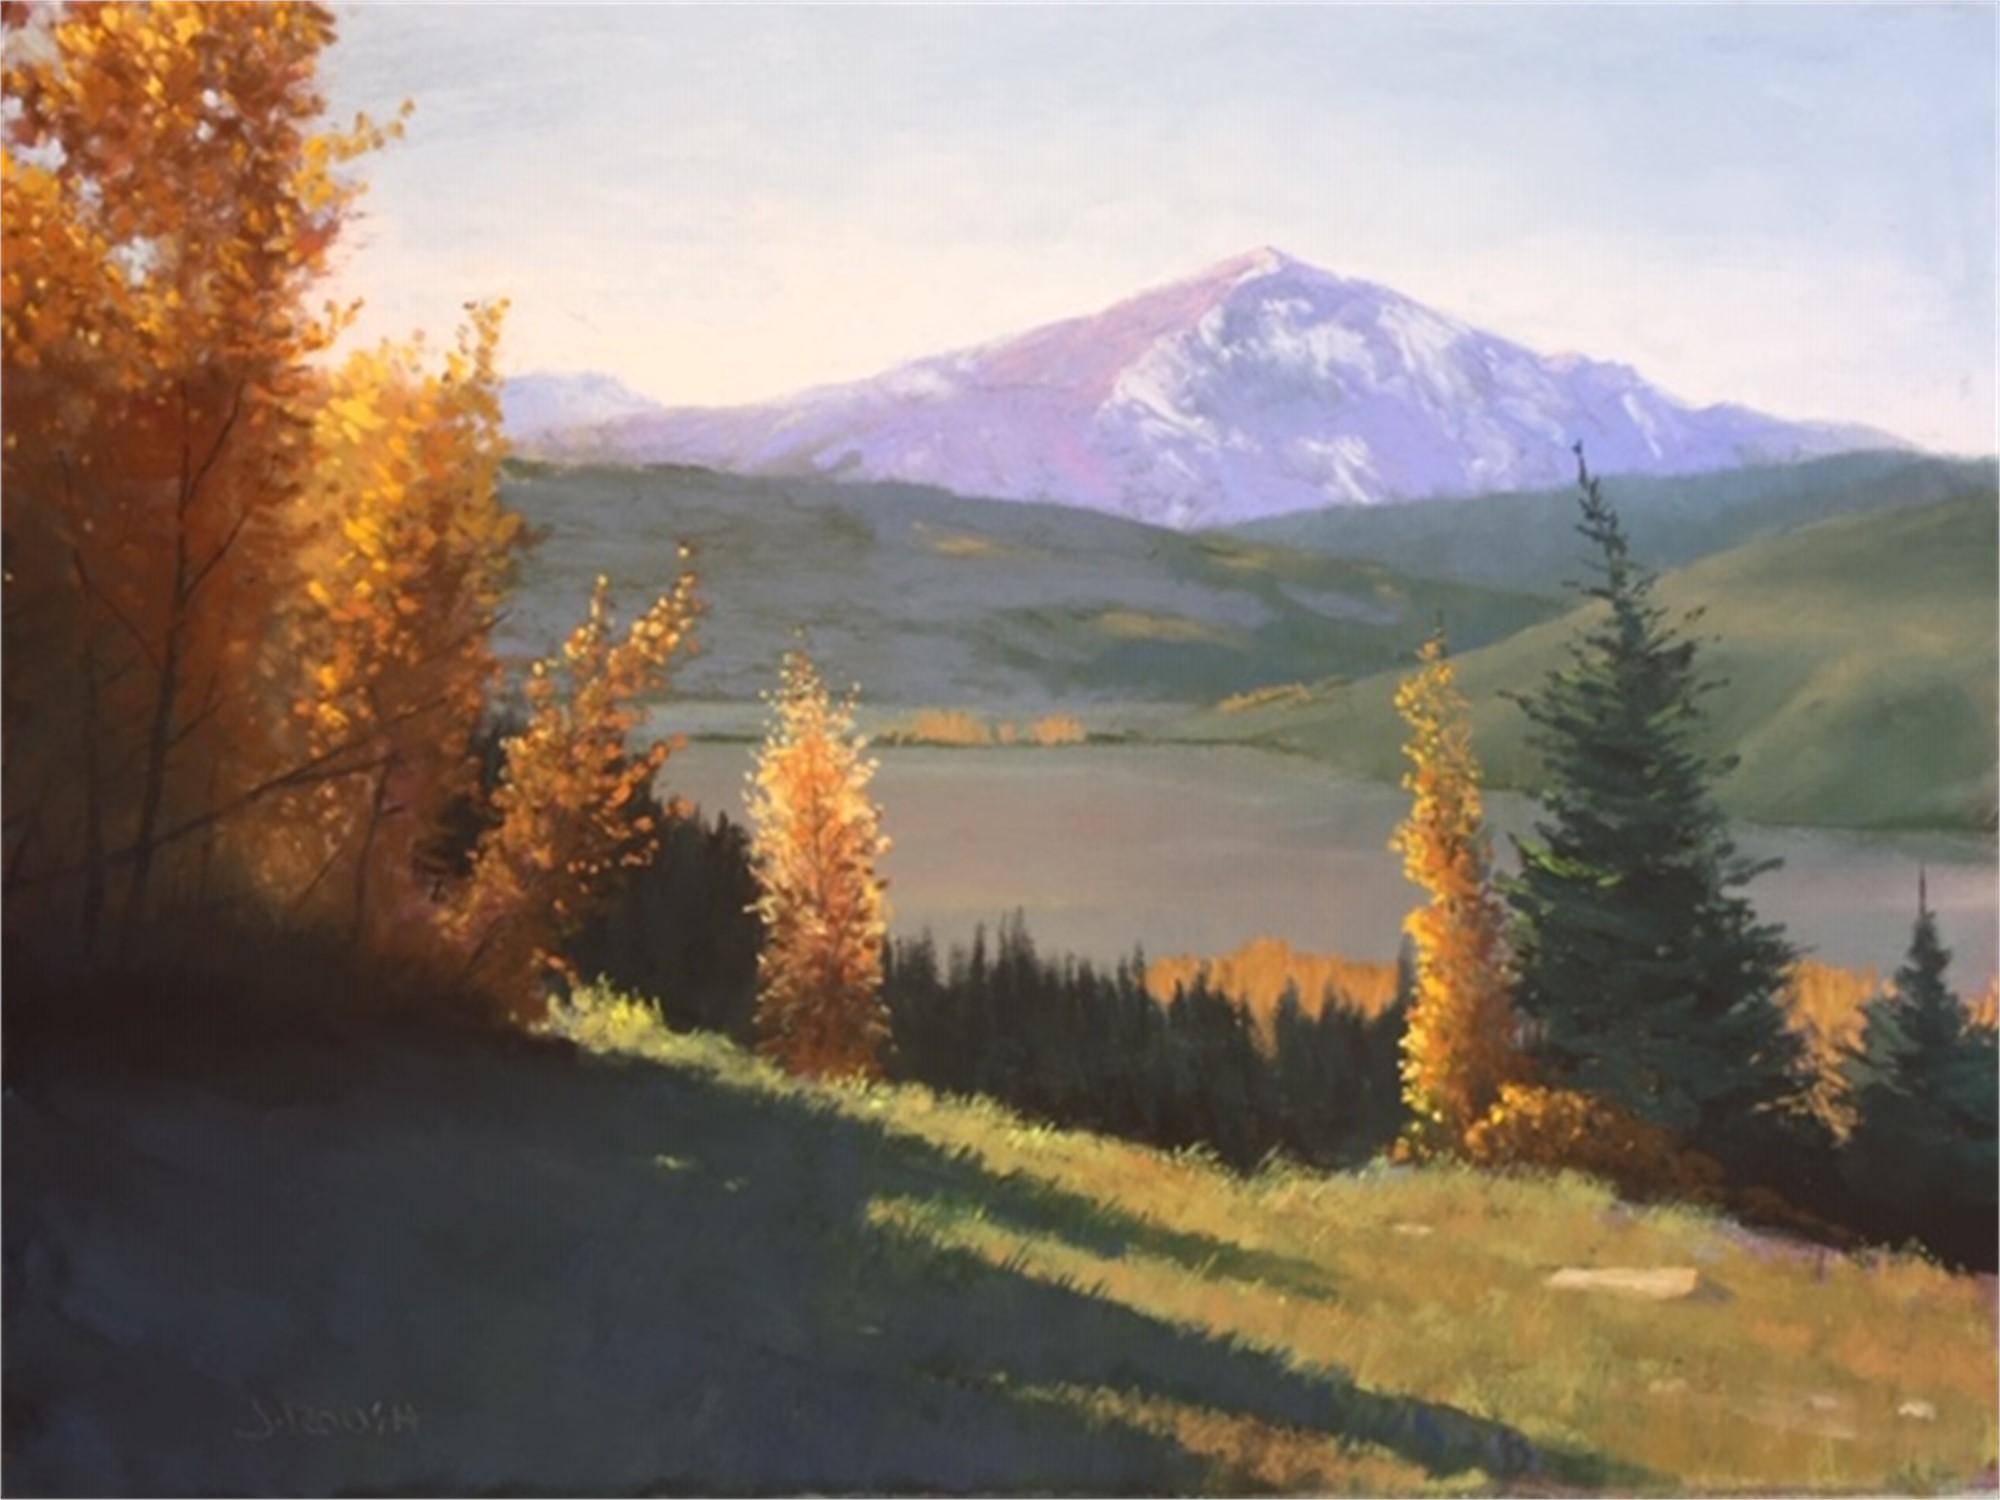 Autumn Gold by John Roush